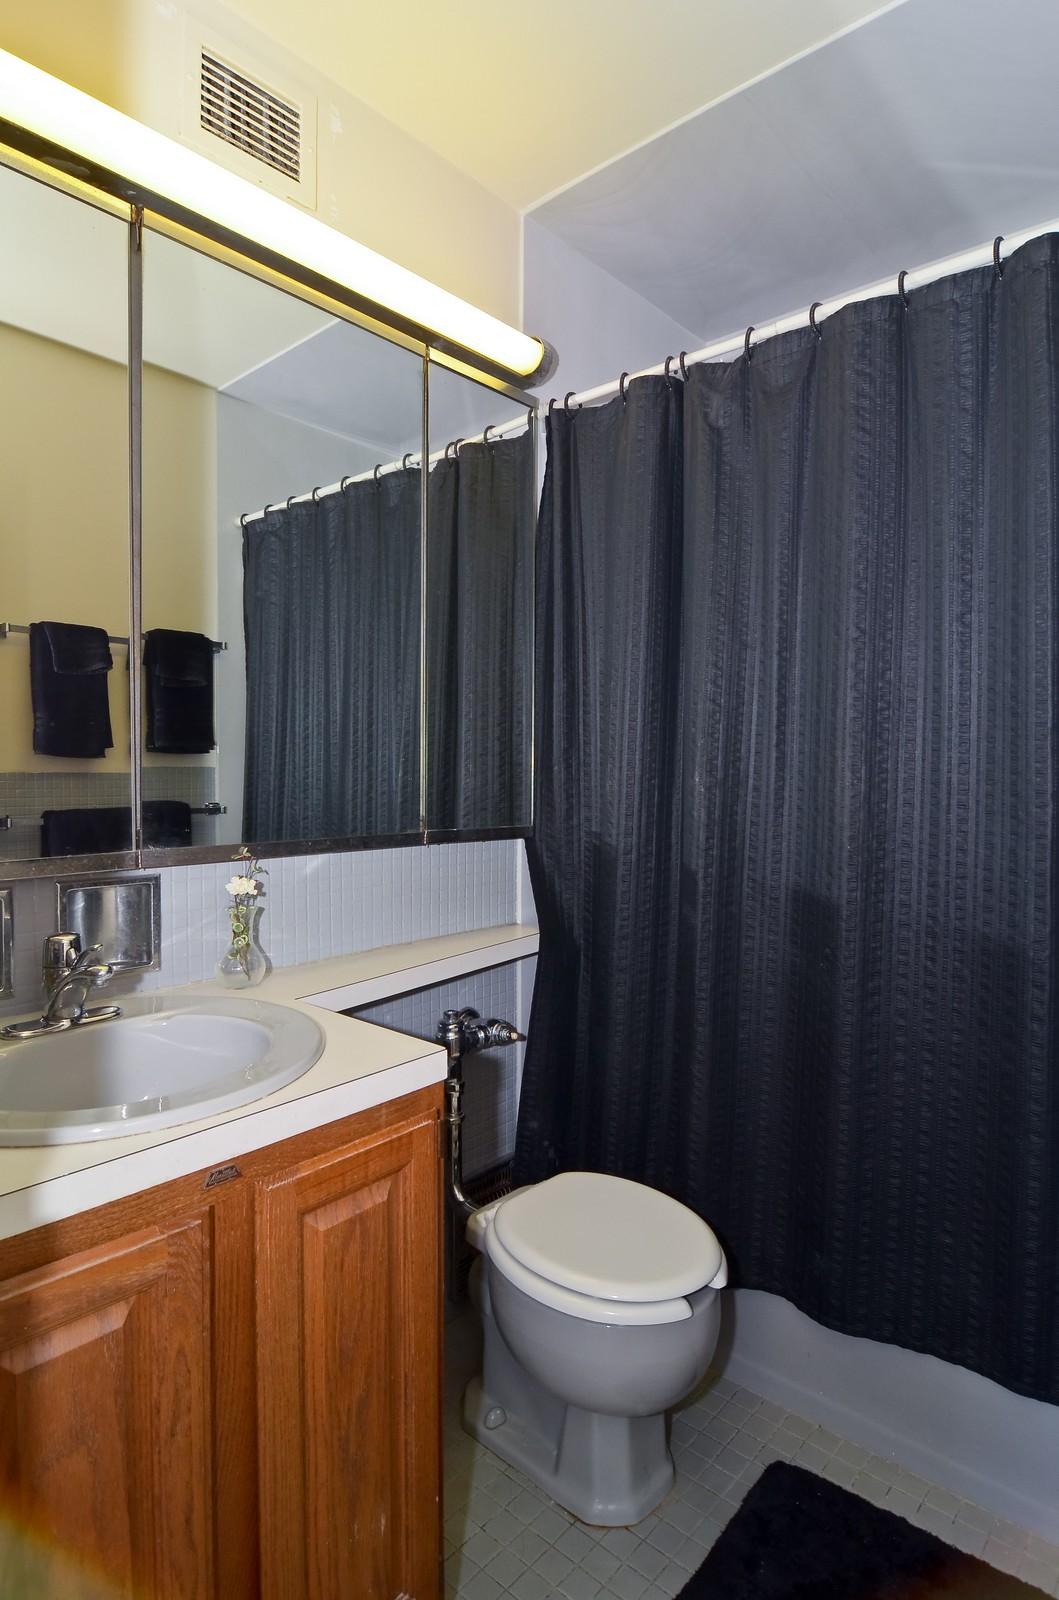 Real Estate Photography - 1550 N Lakeshore Dr, Unit 2E, Chicago, IL, 60610 - Bathroom